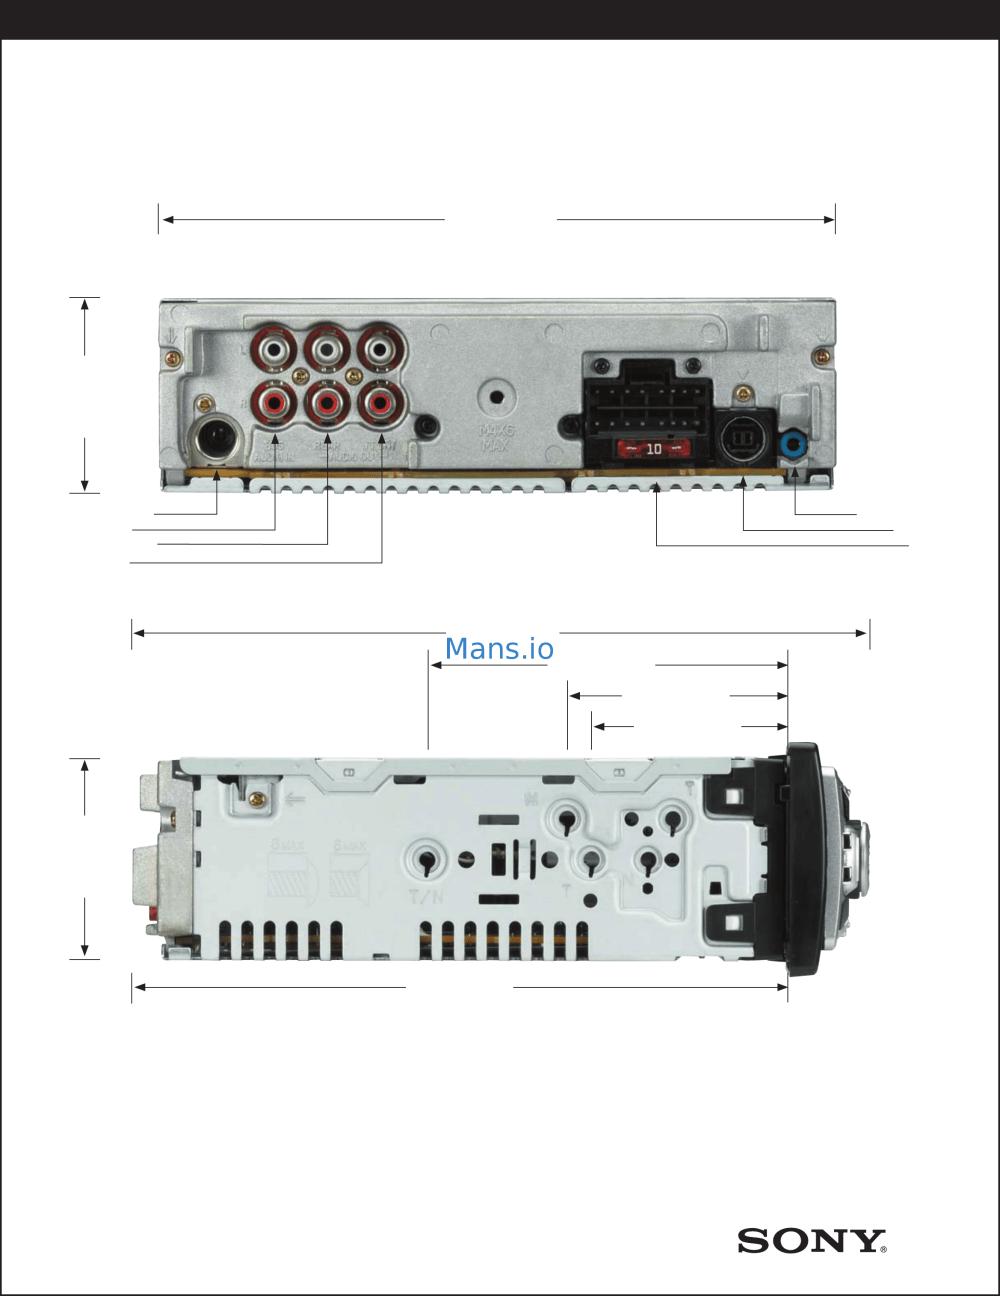 medium resolution of sony cdx f5500 wiring diagram wiring diagram h8 sony xplod stereo wiring diagram sony xav 60 wiring diagram